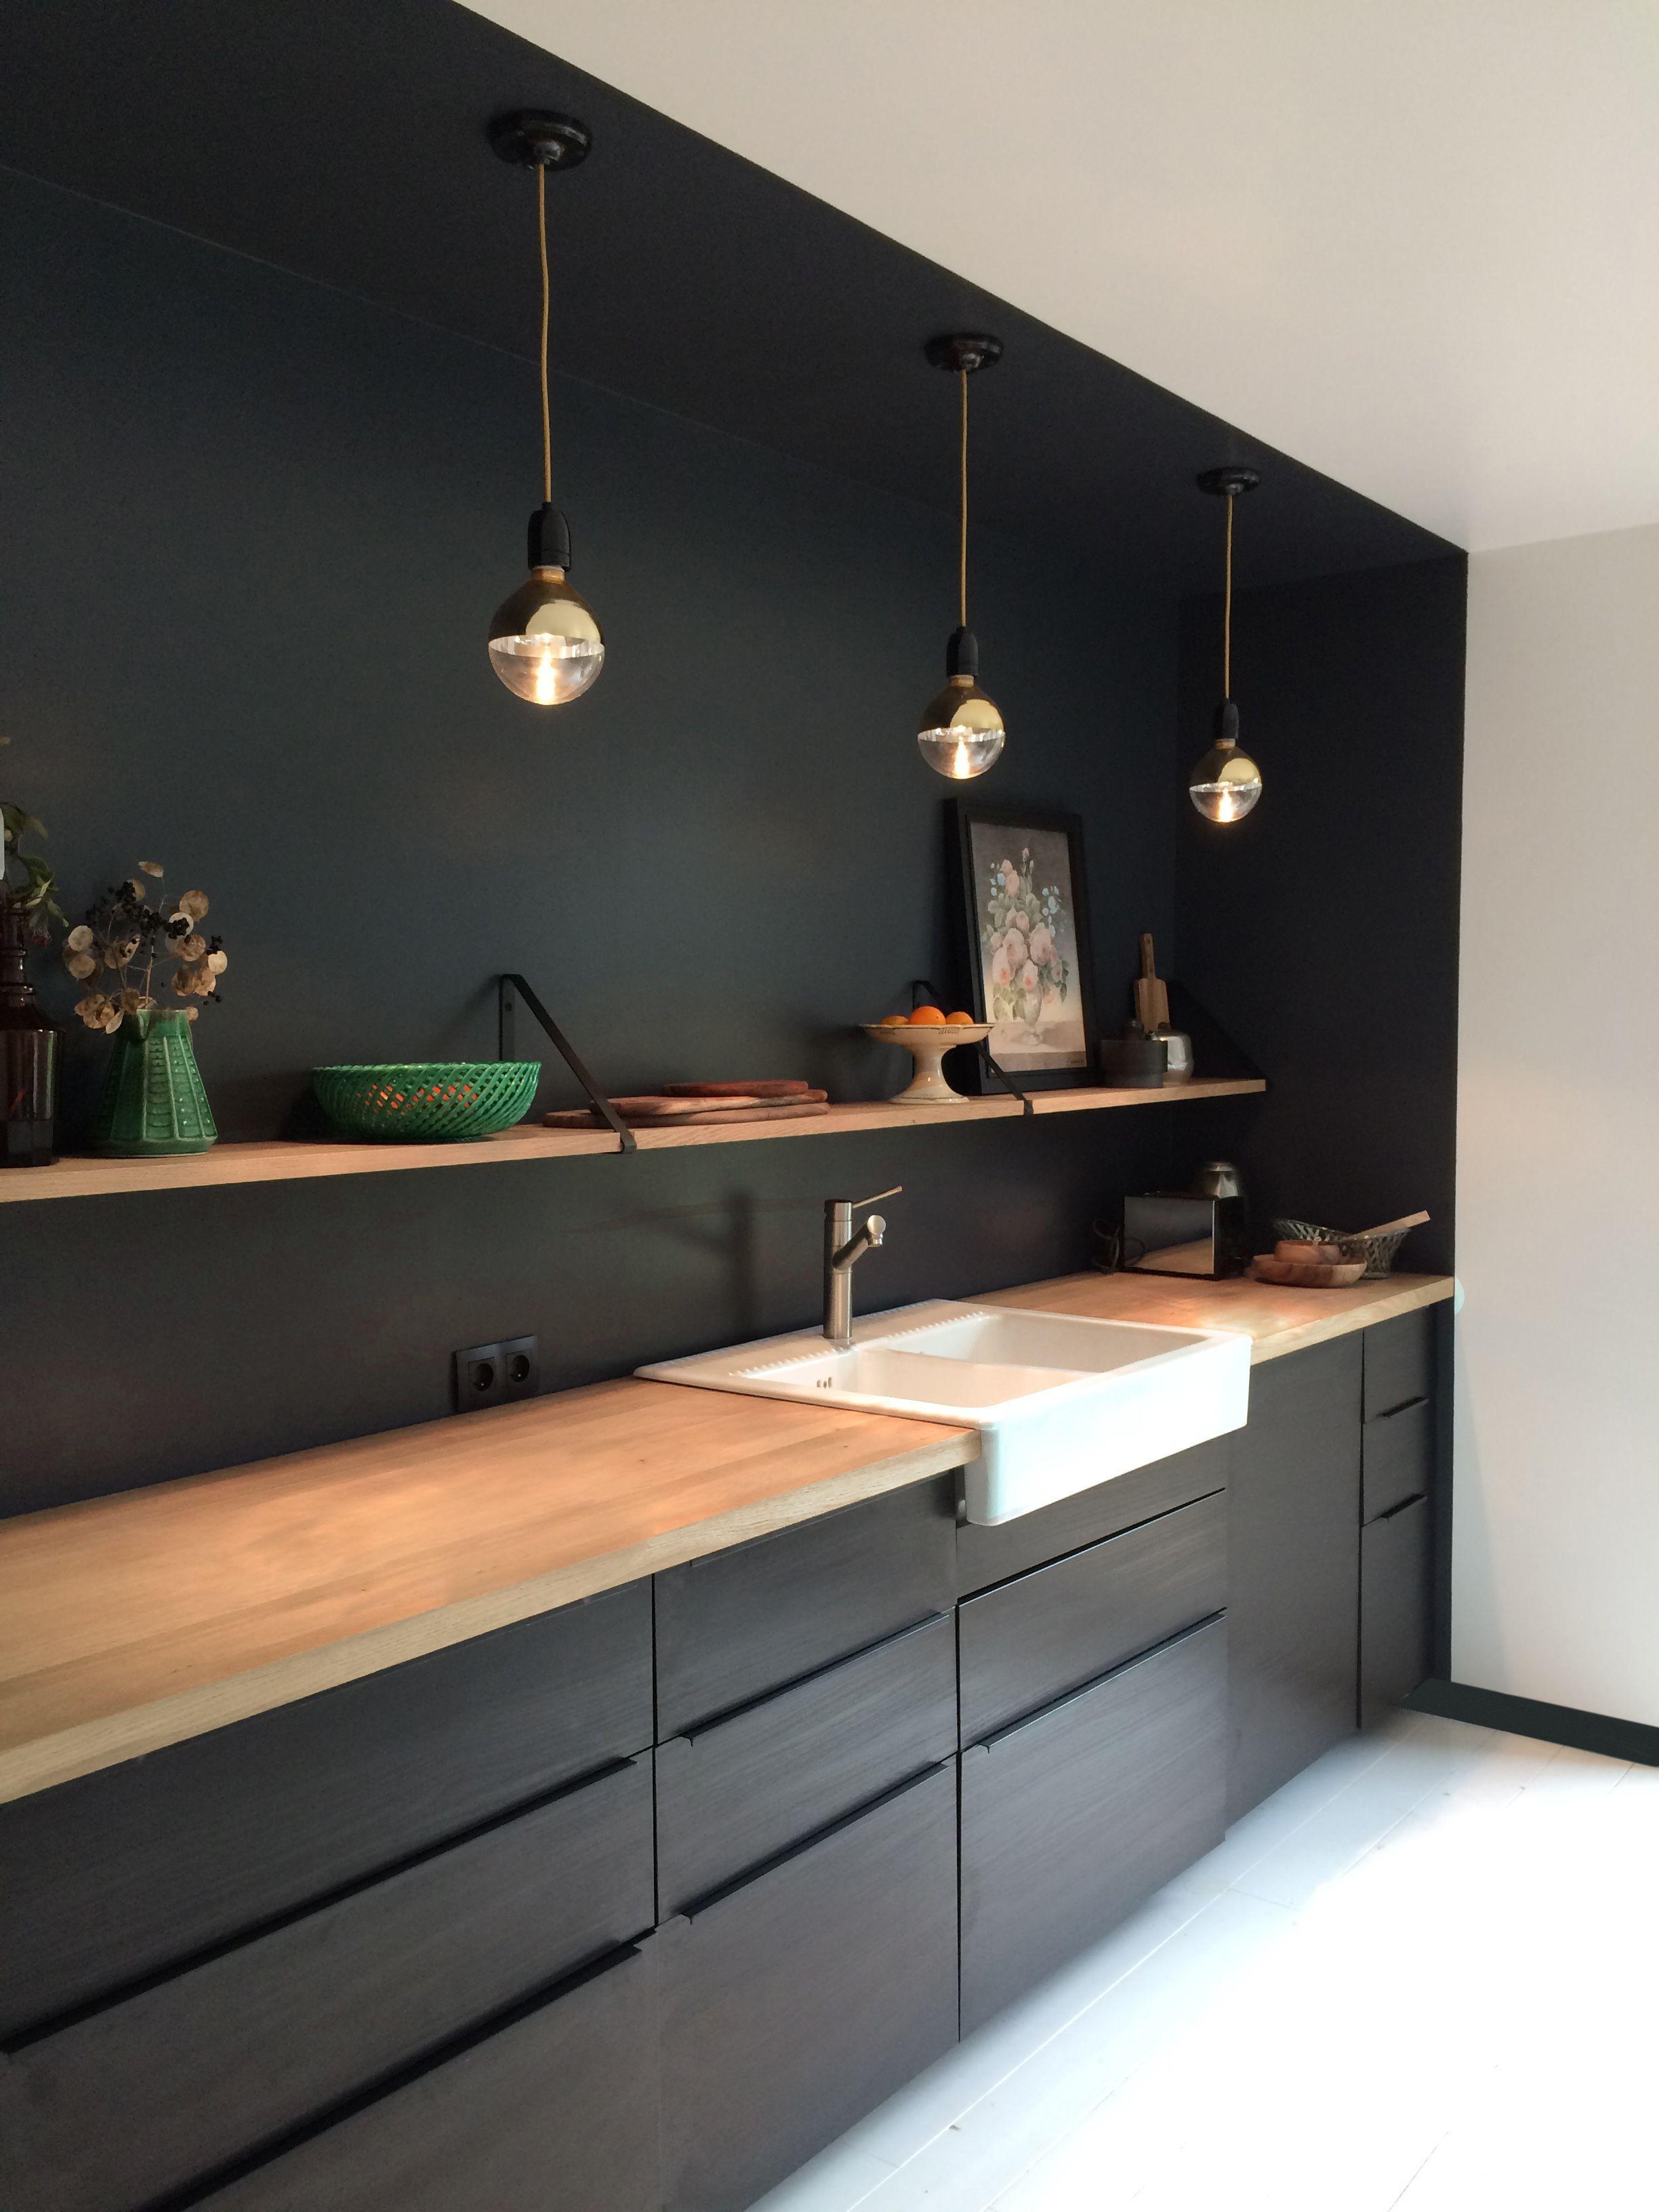 ikea küchenmodul holz | metod ist kein Äppelkaka neues küchensystem